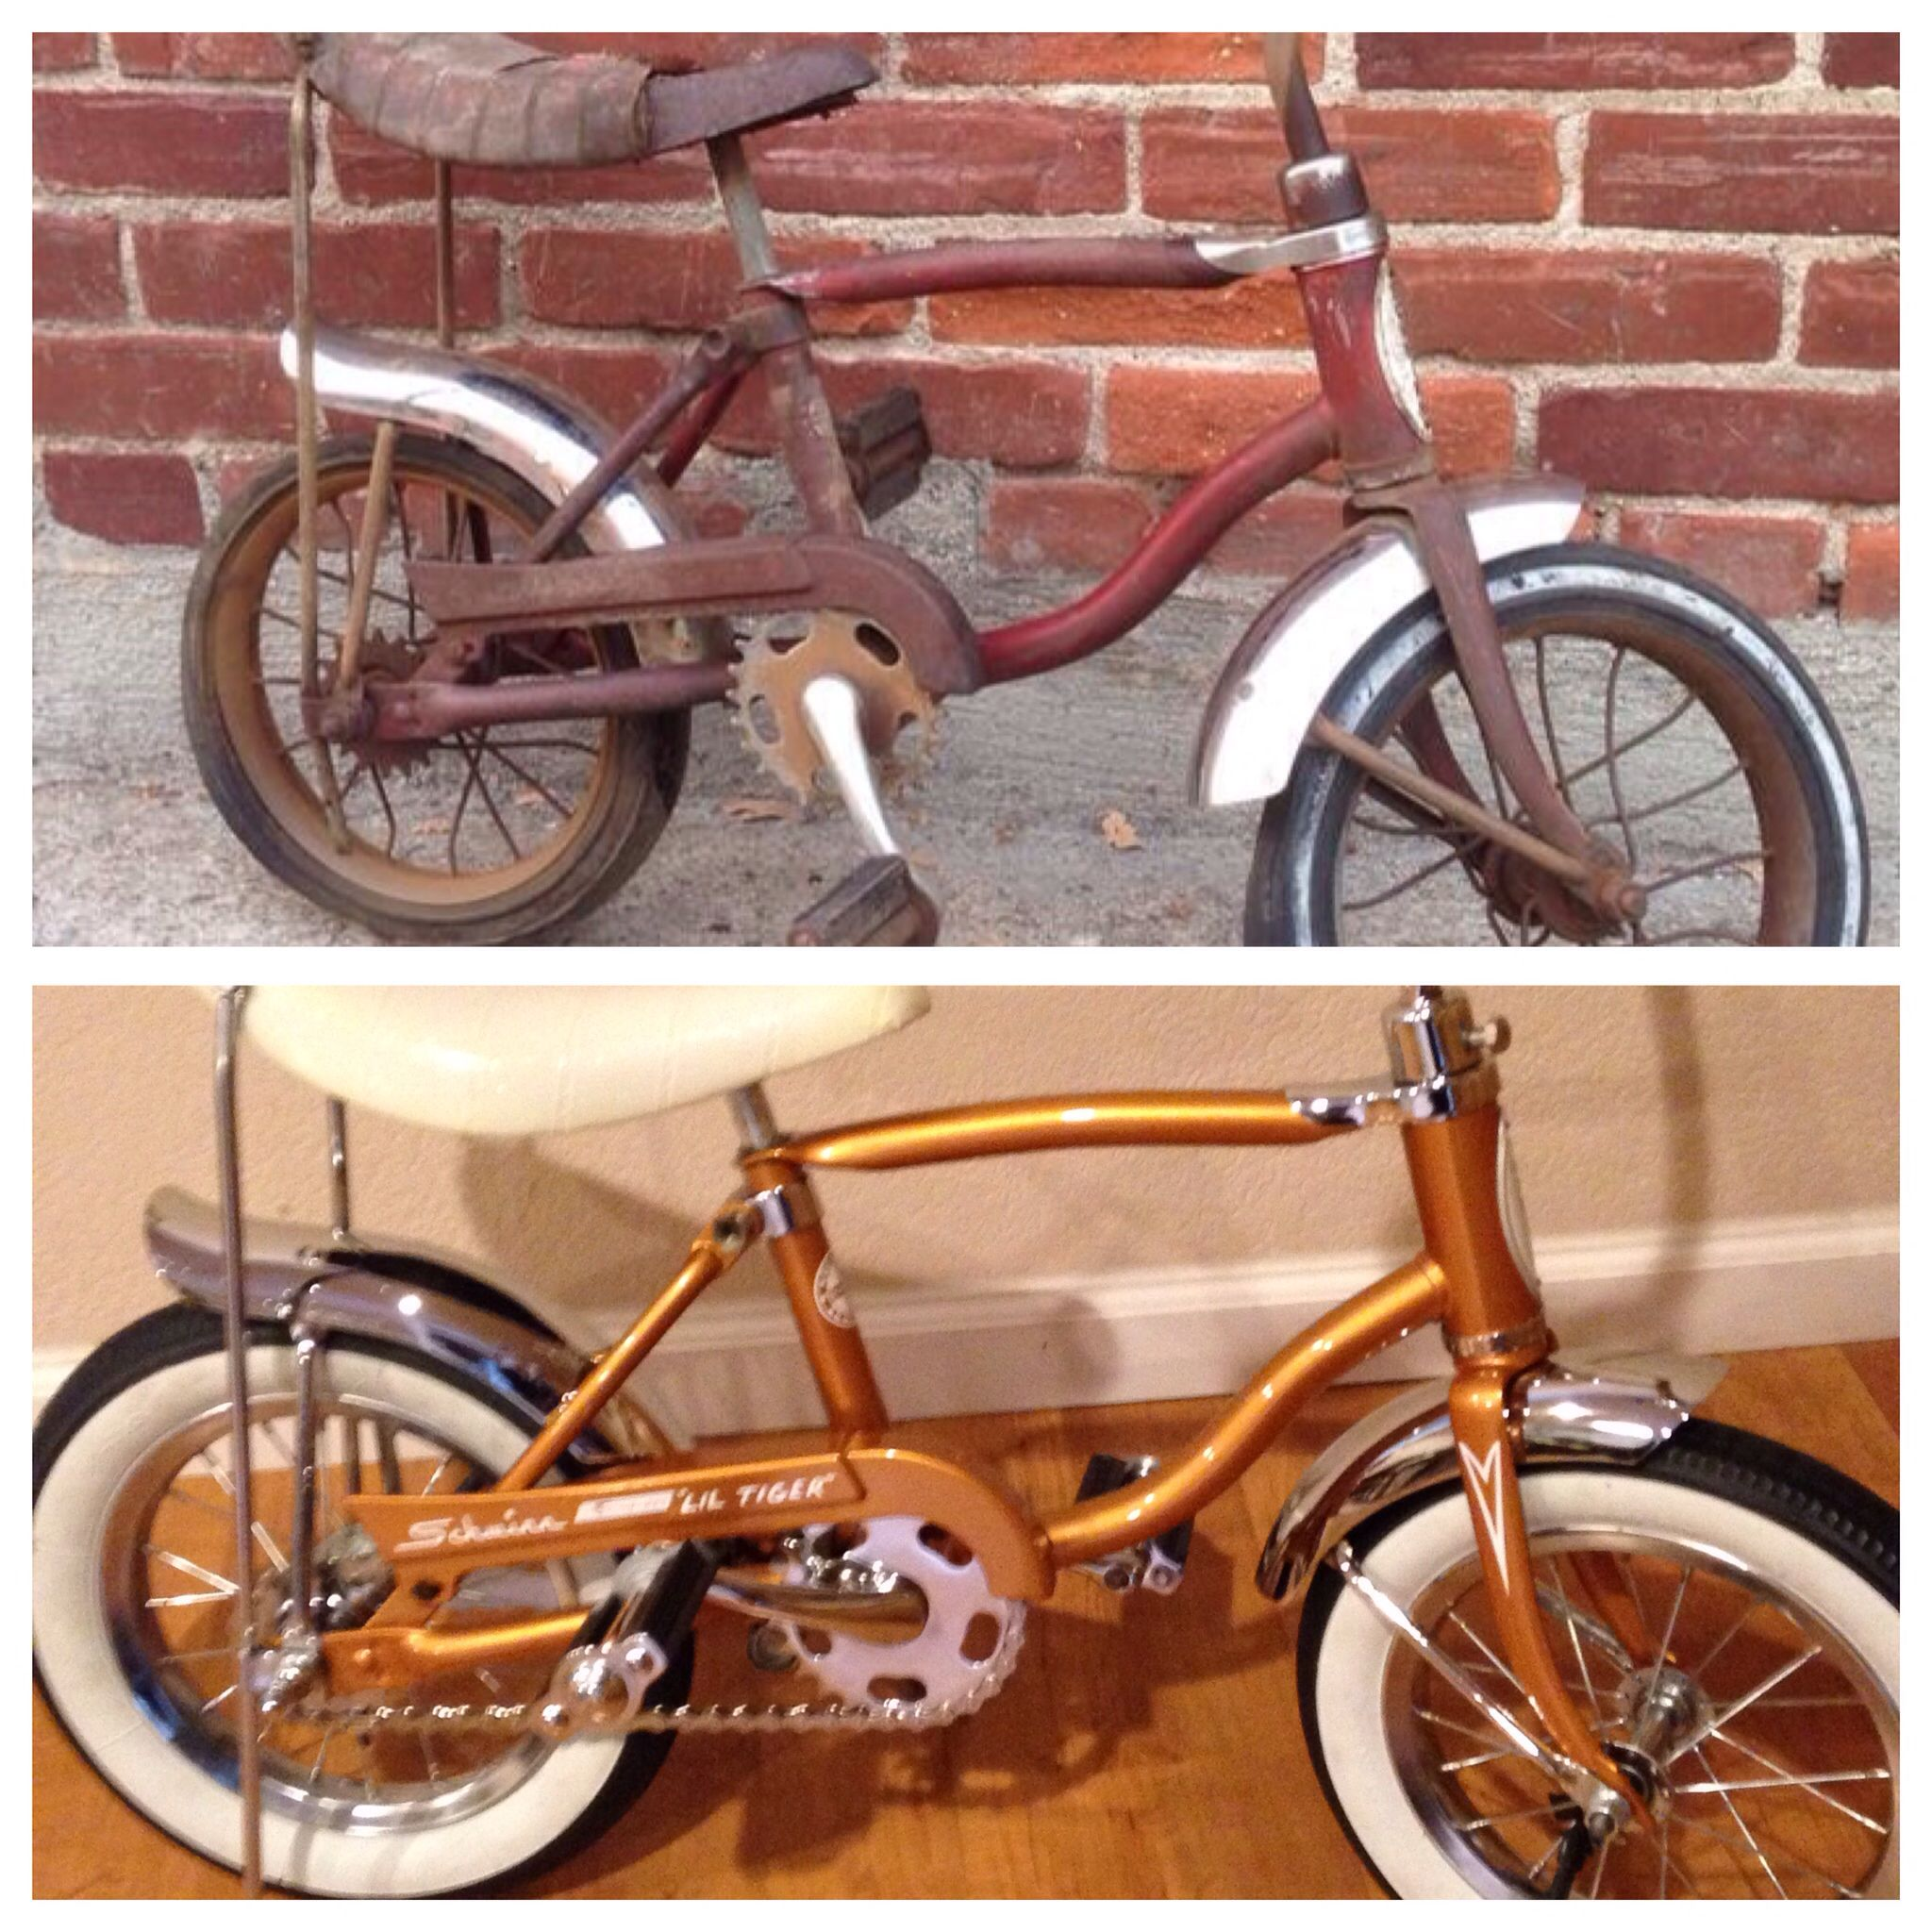 00aa06e2d7f Before and after Schwinn lil tiger | SoCal Schwinn's | Bicycle ...